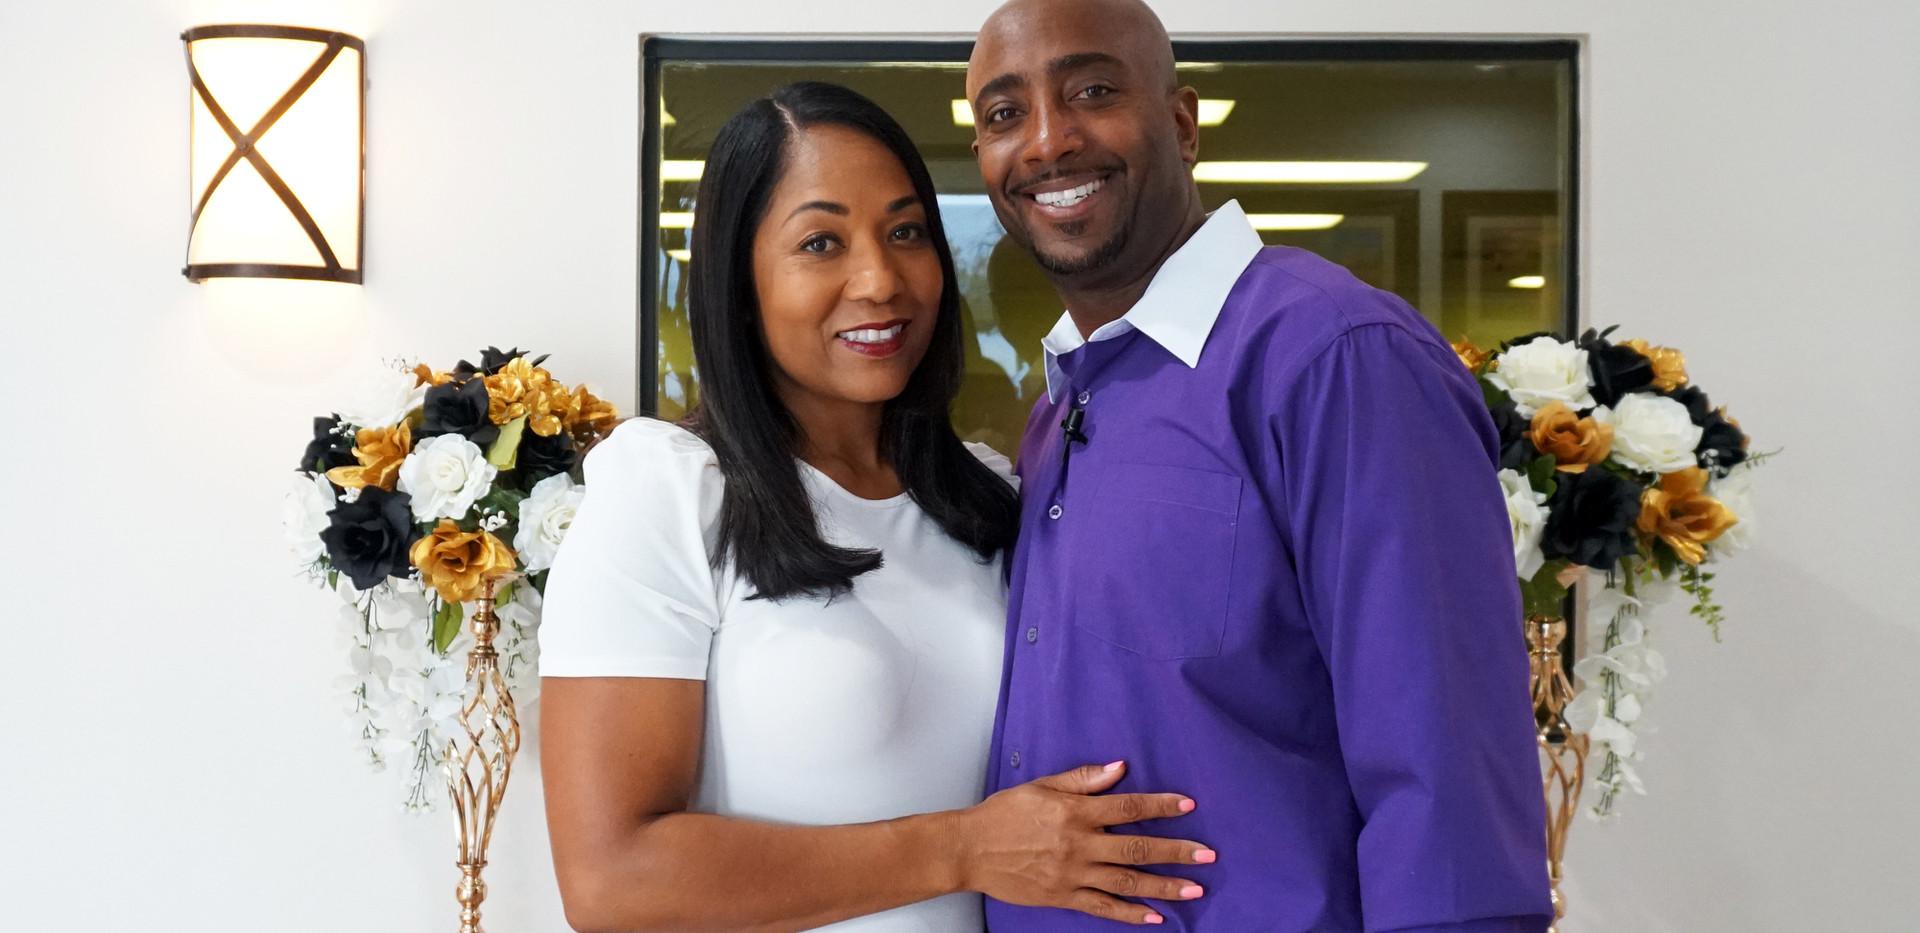 Sr. Pastor Mark & Lady Michelle Greenhouse